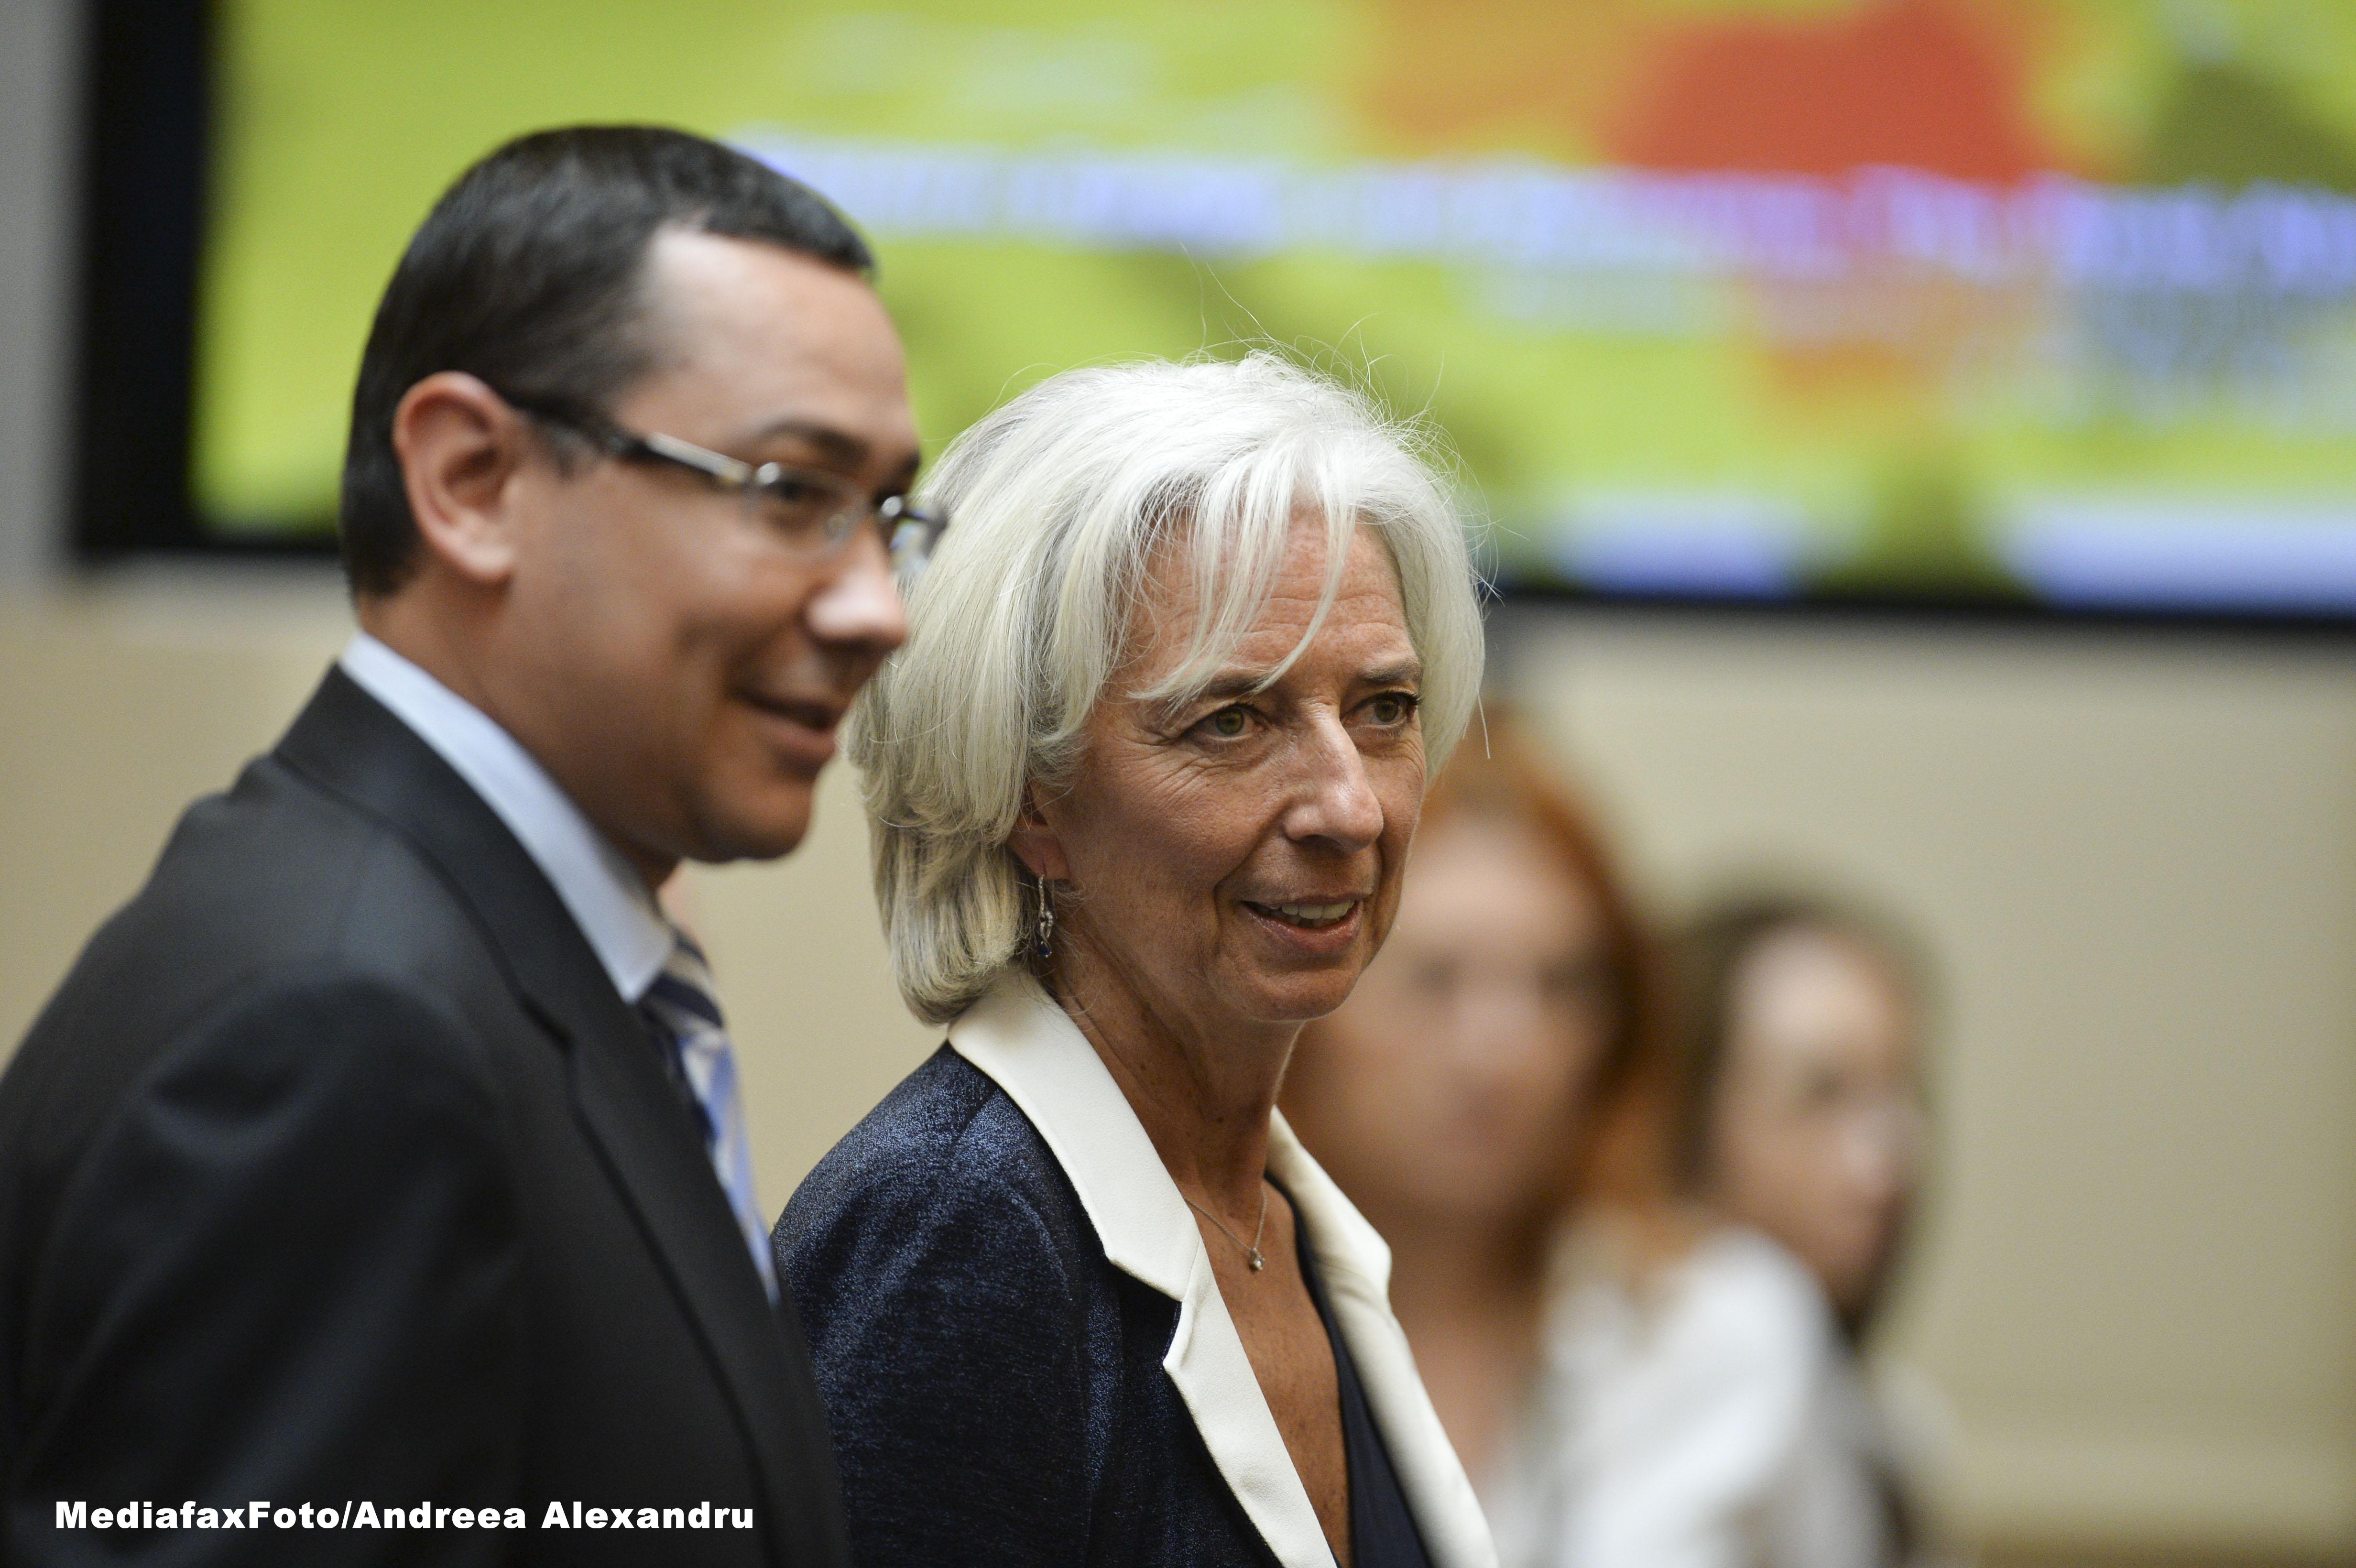 Ponta: FMI ne-a transmis ca e mai bine sa refacem procedura la CFR Marfa decat sa fie contestata